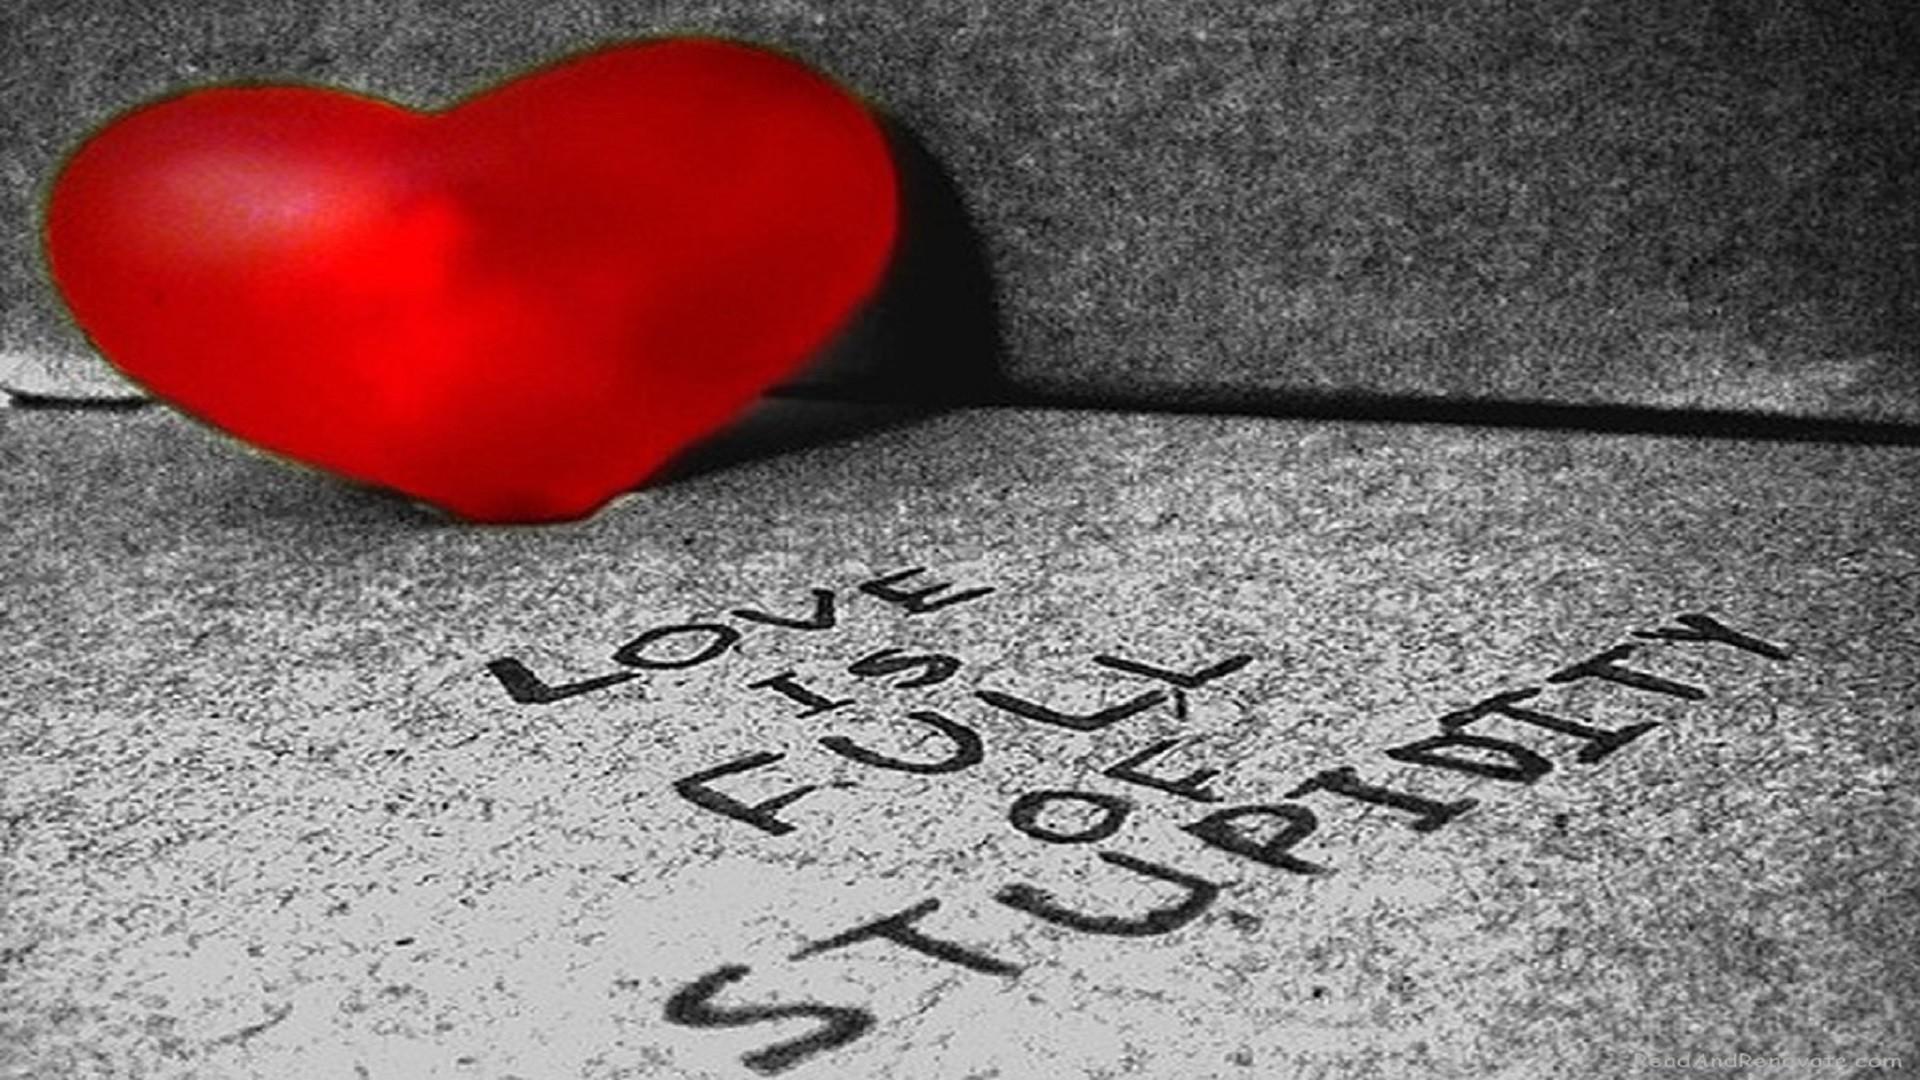 Res: 1920x1080, love-is-full-of-stupidity-broken-heart-hd-